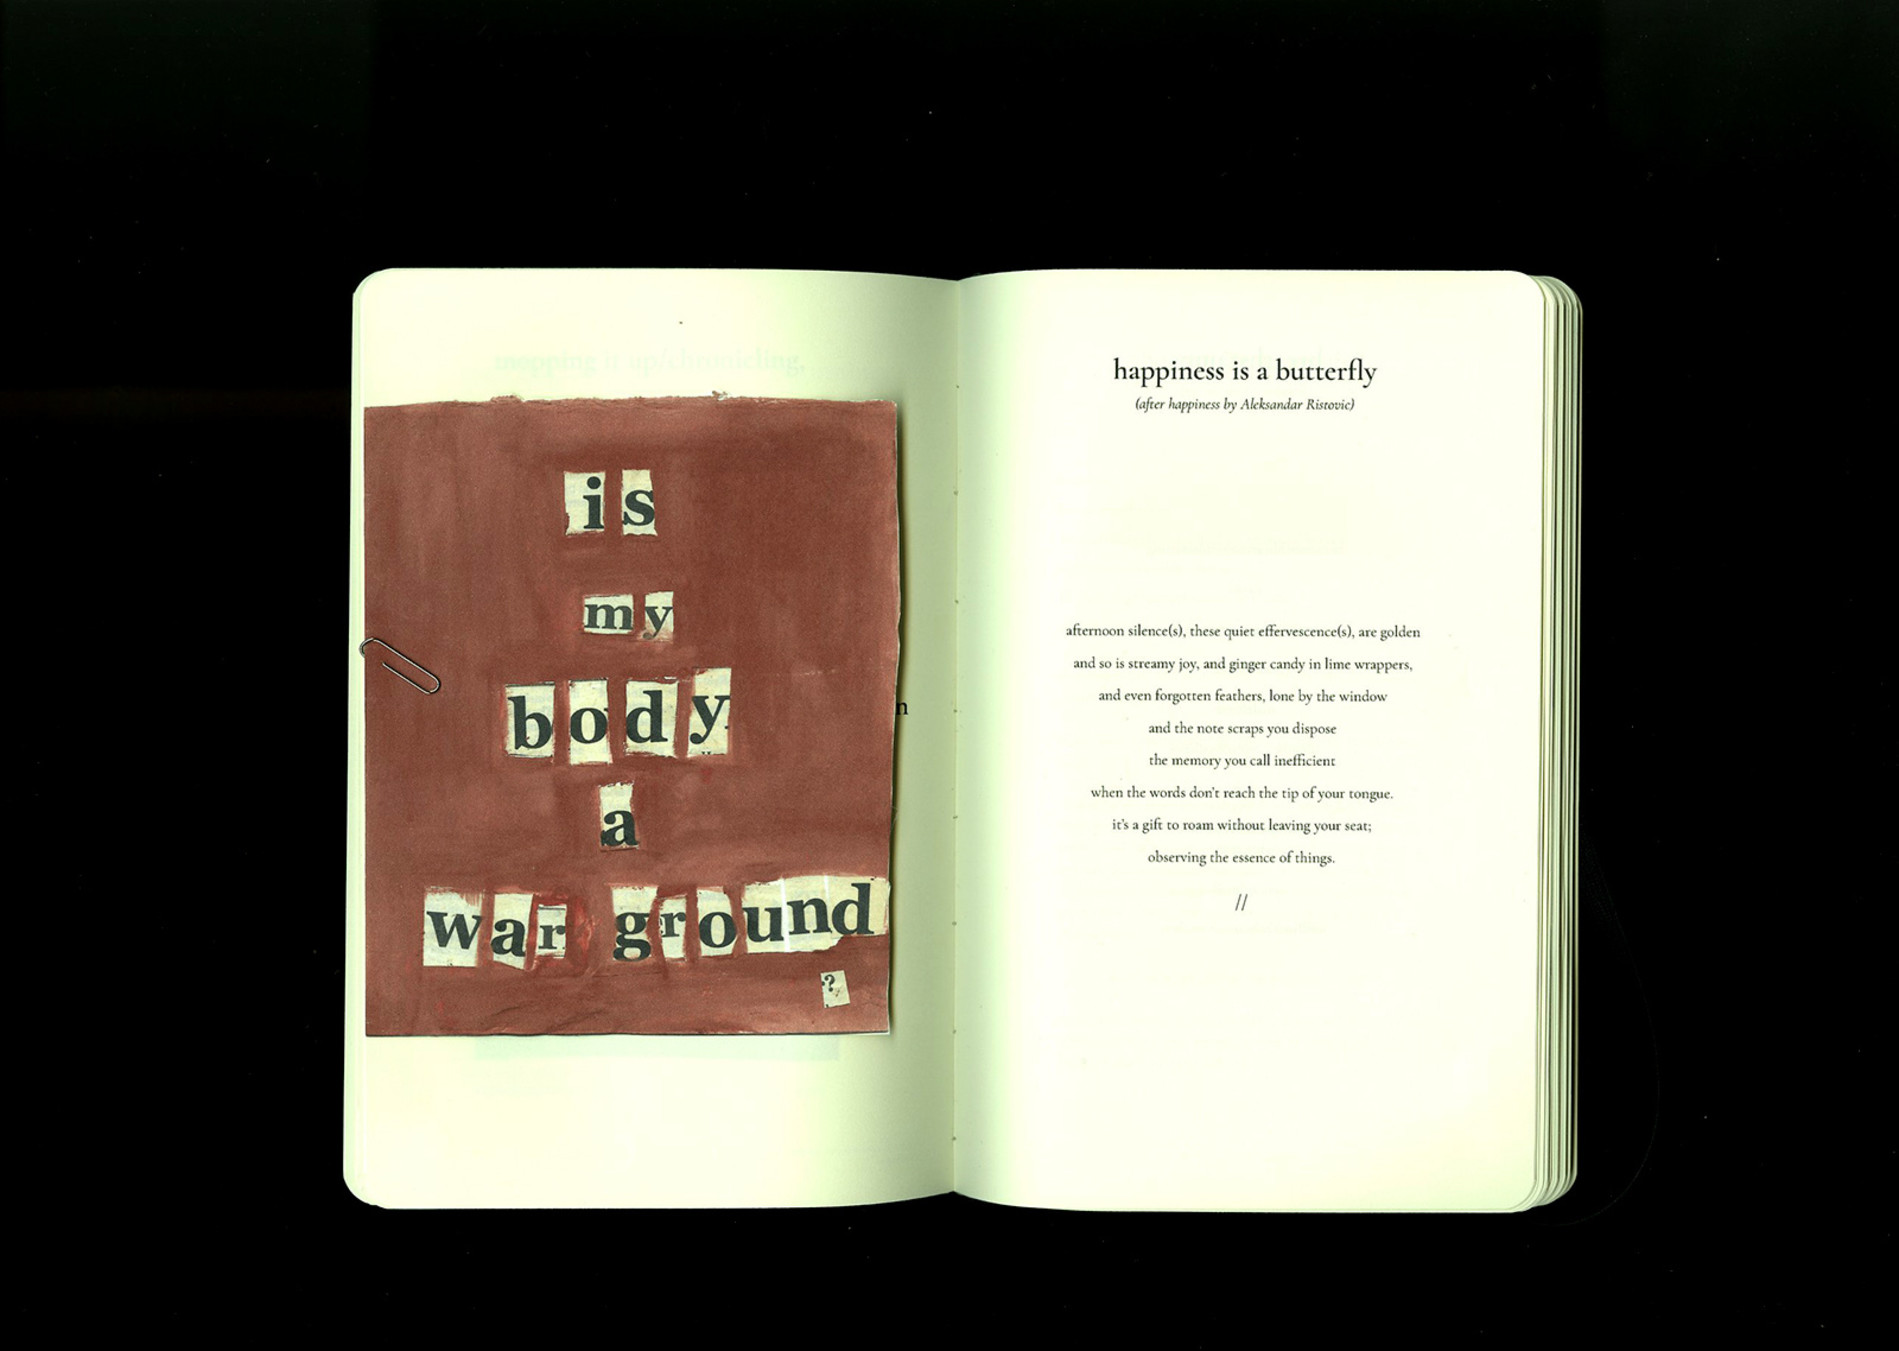 25EBroadway Whiskey Squid (Memoirs)